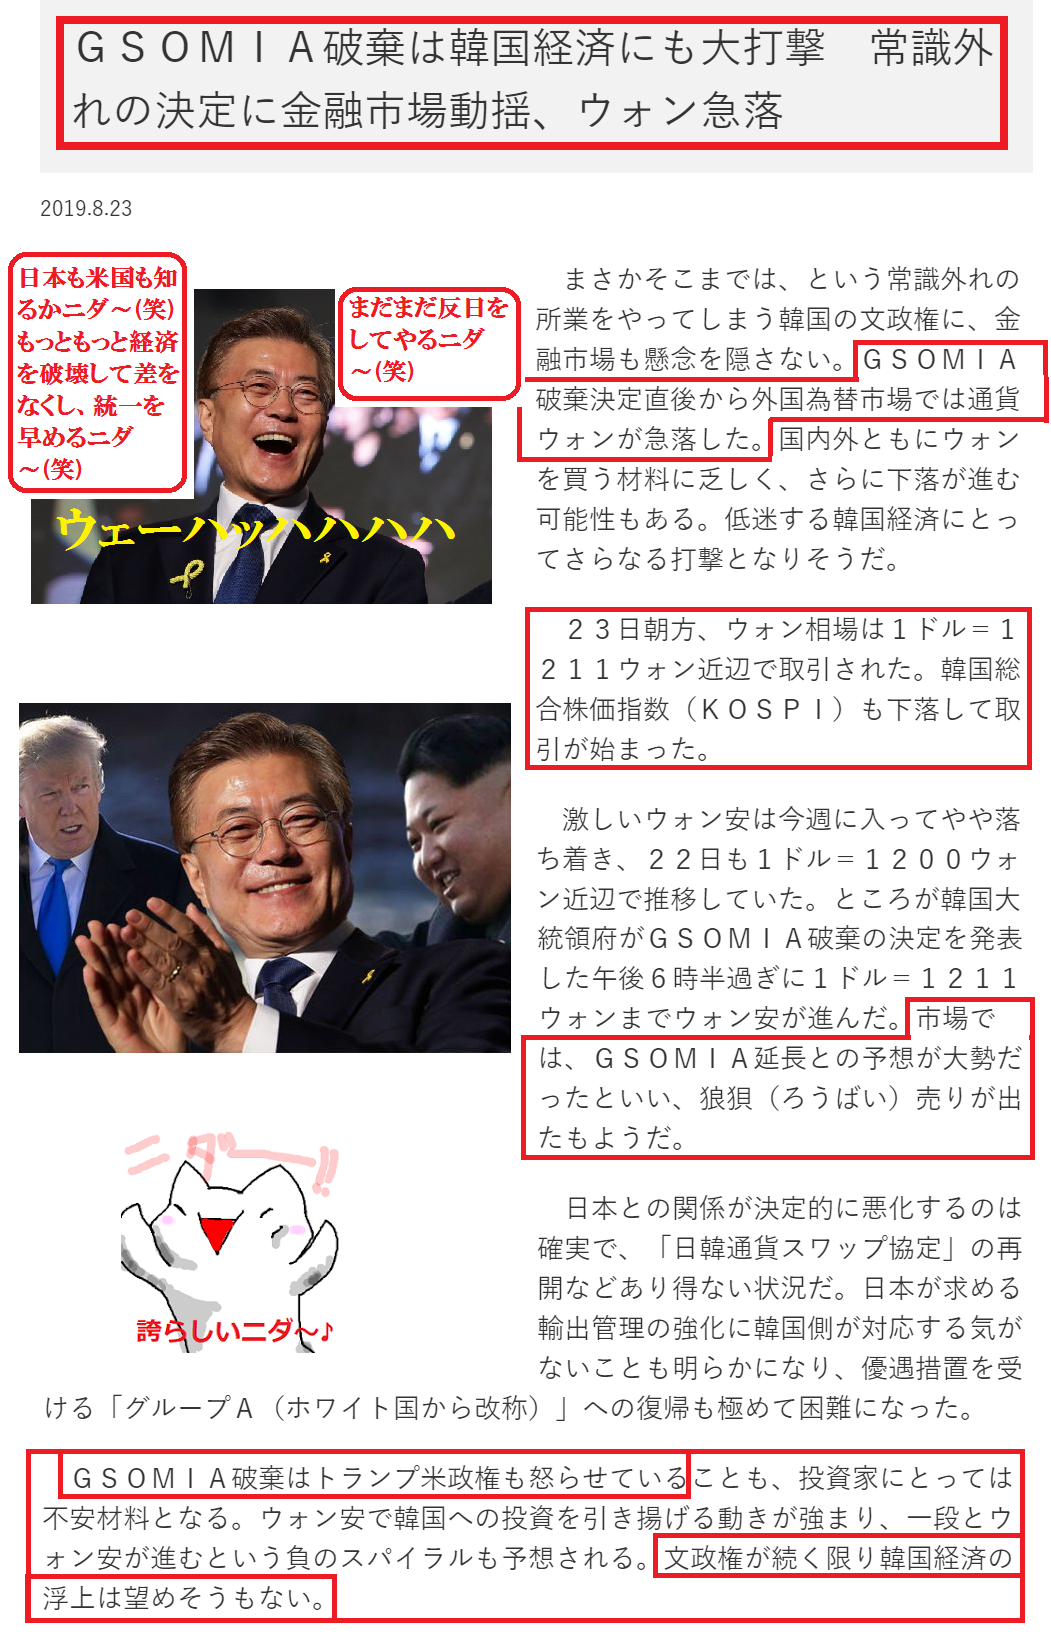 GSOMIA破棄でチョン国株価暴落